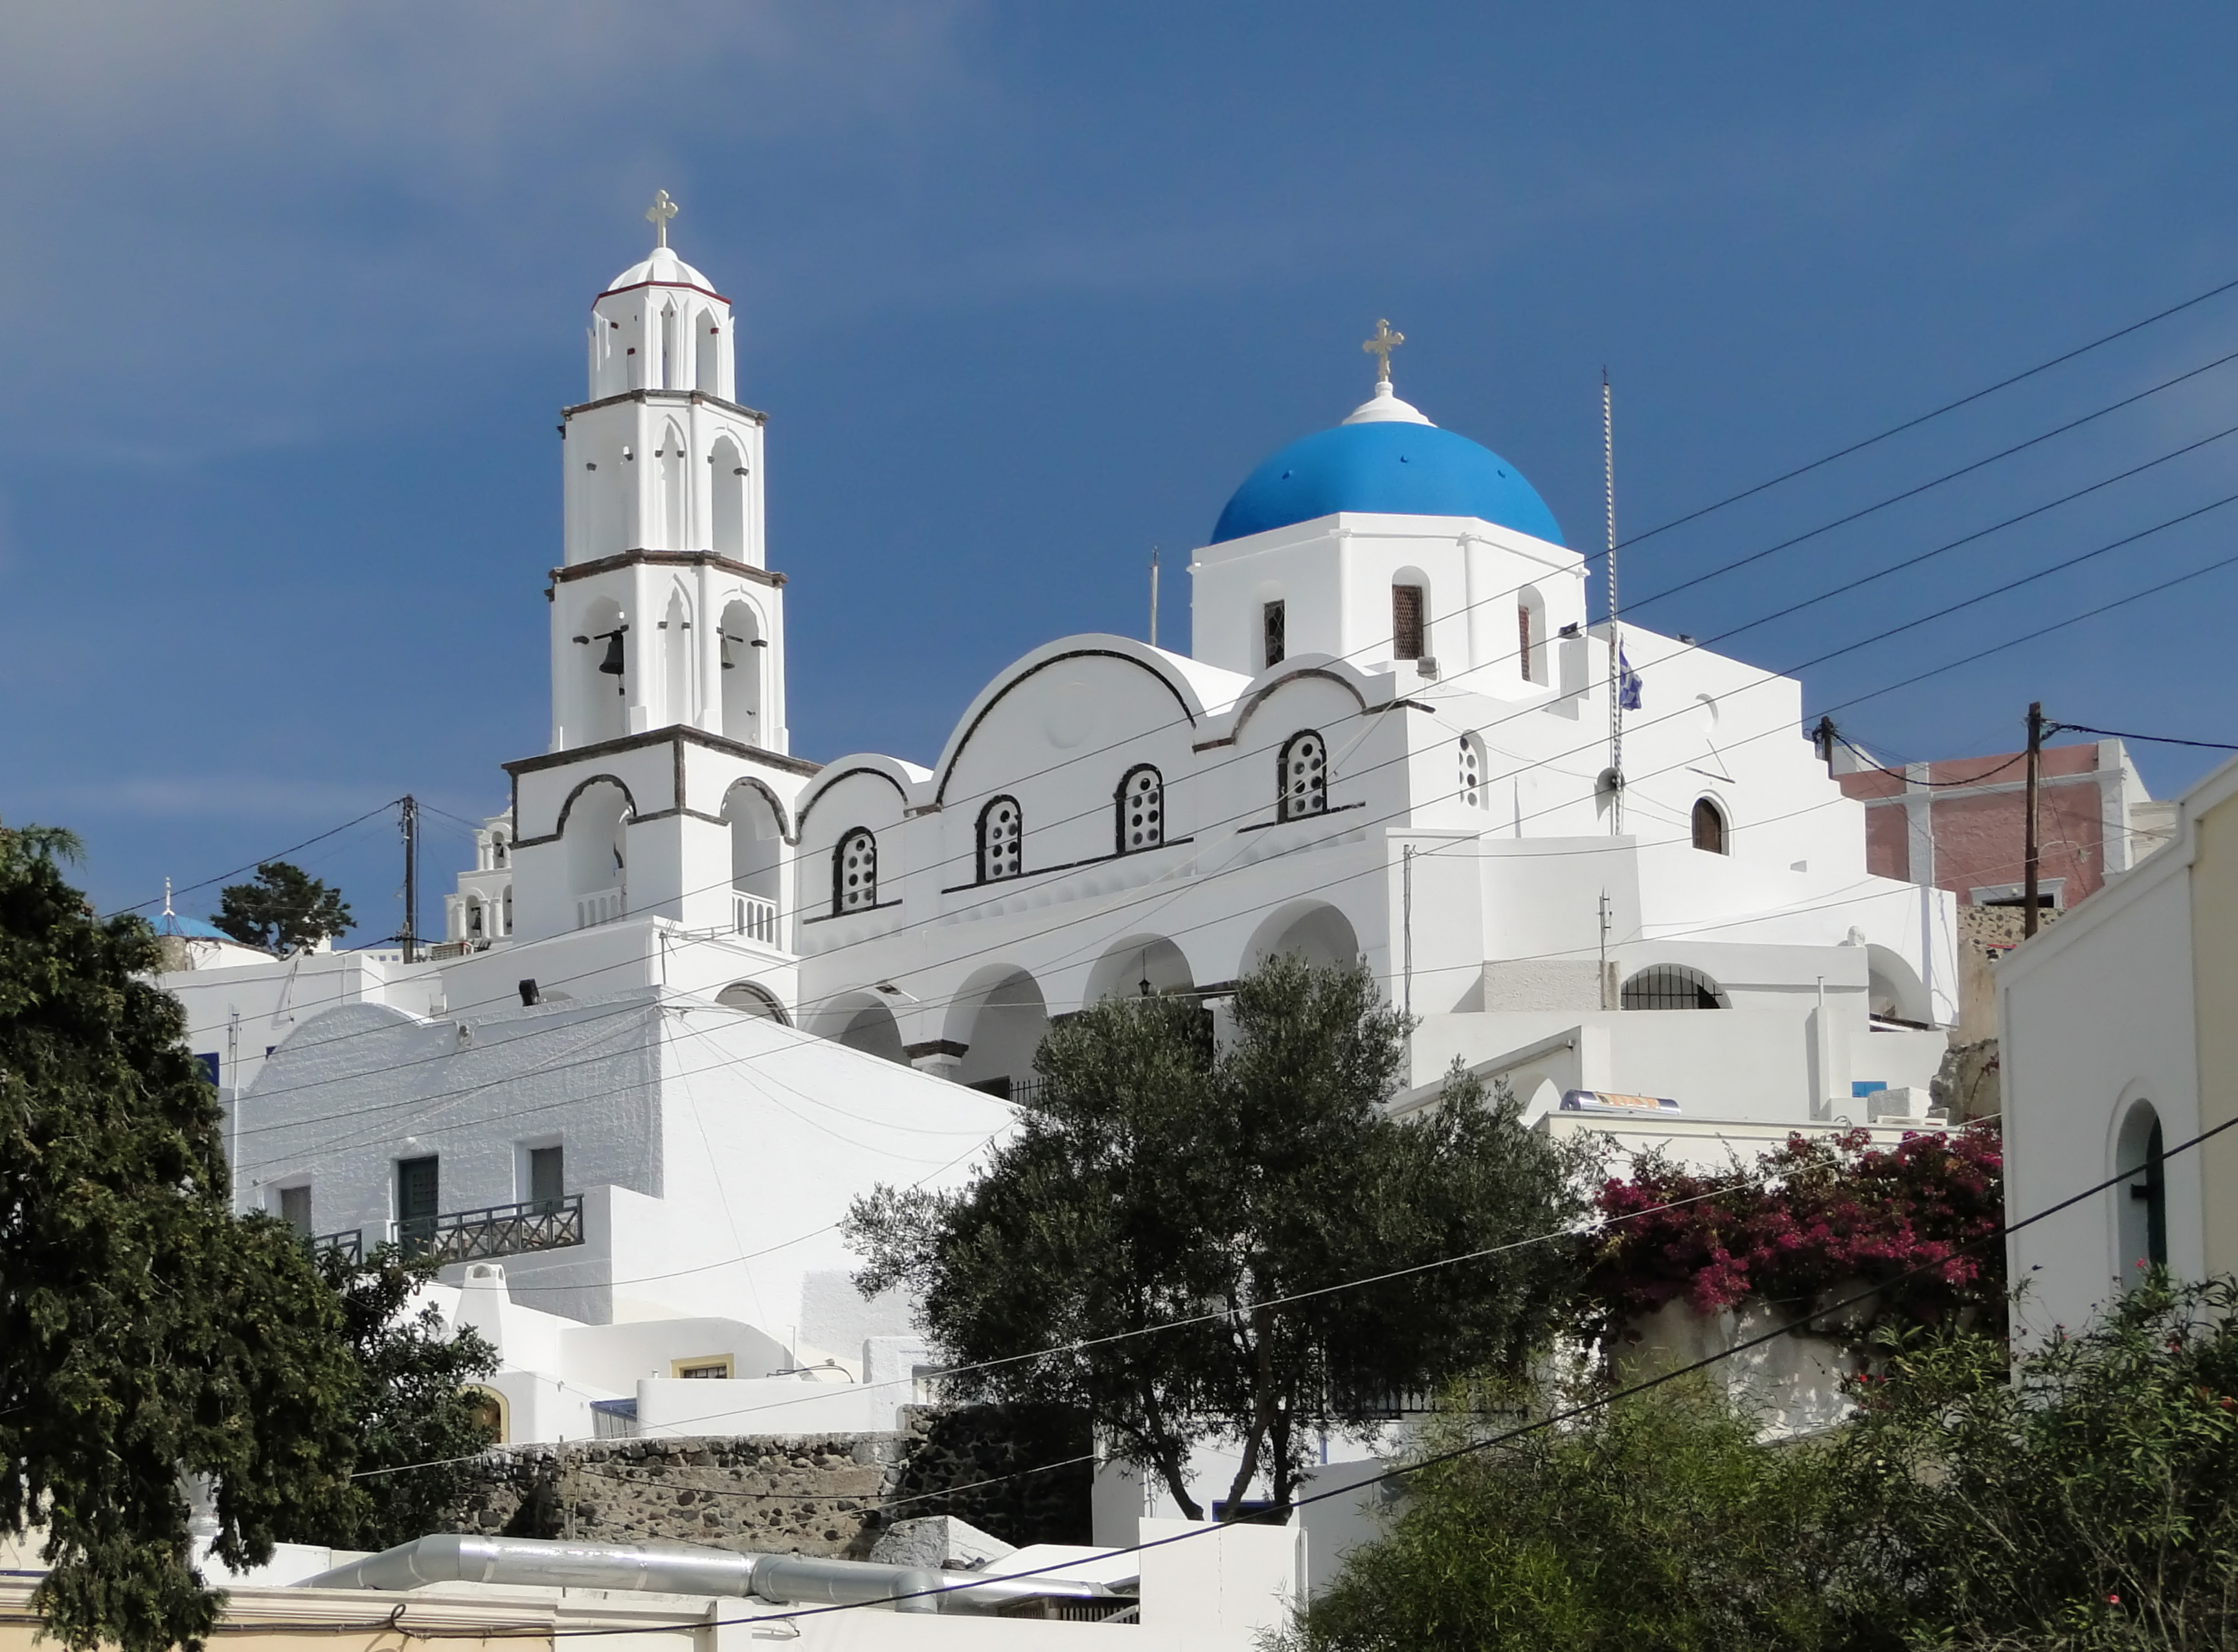 File:Agios Nikolaos Church, Pyrgos.jpg - Wikimedia Commons